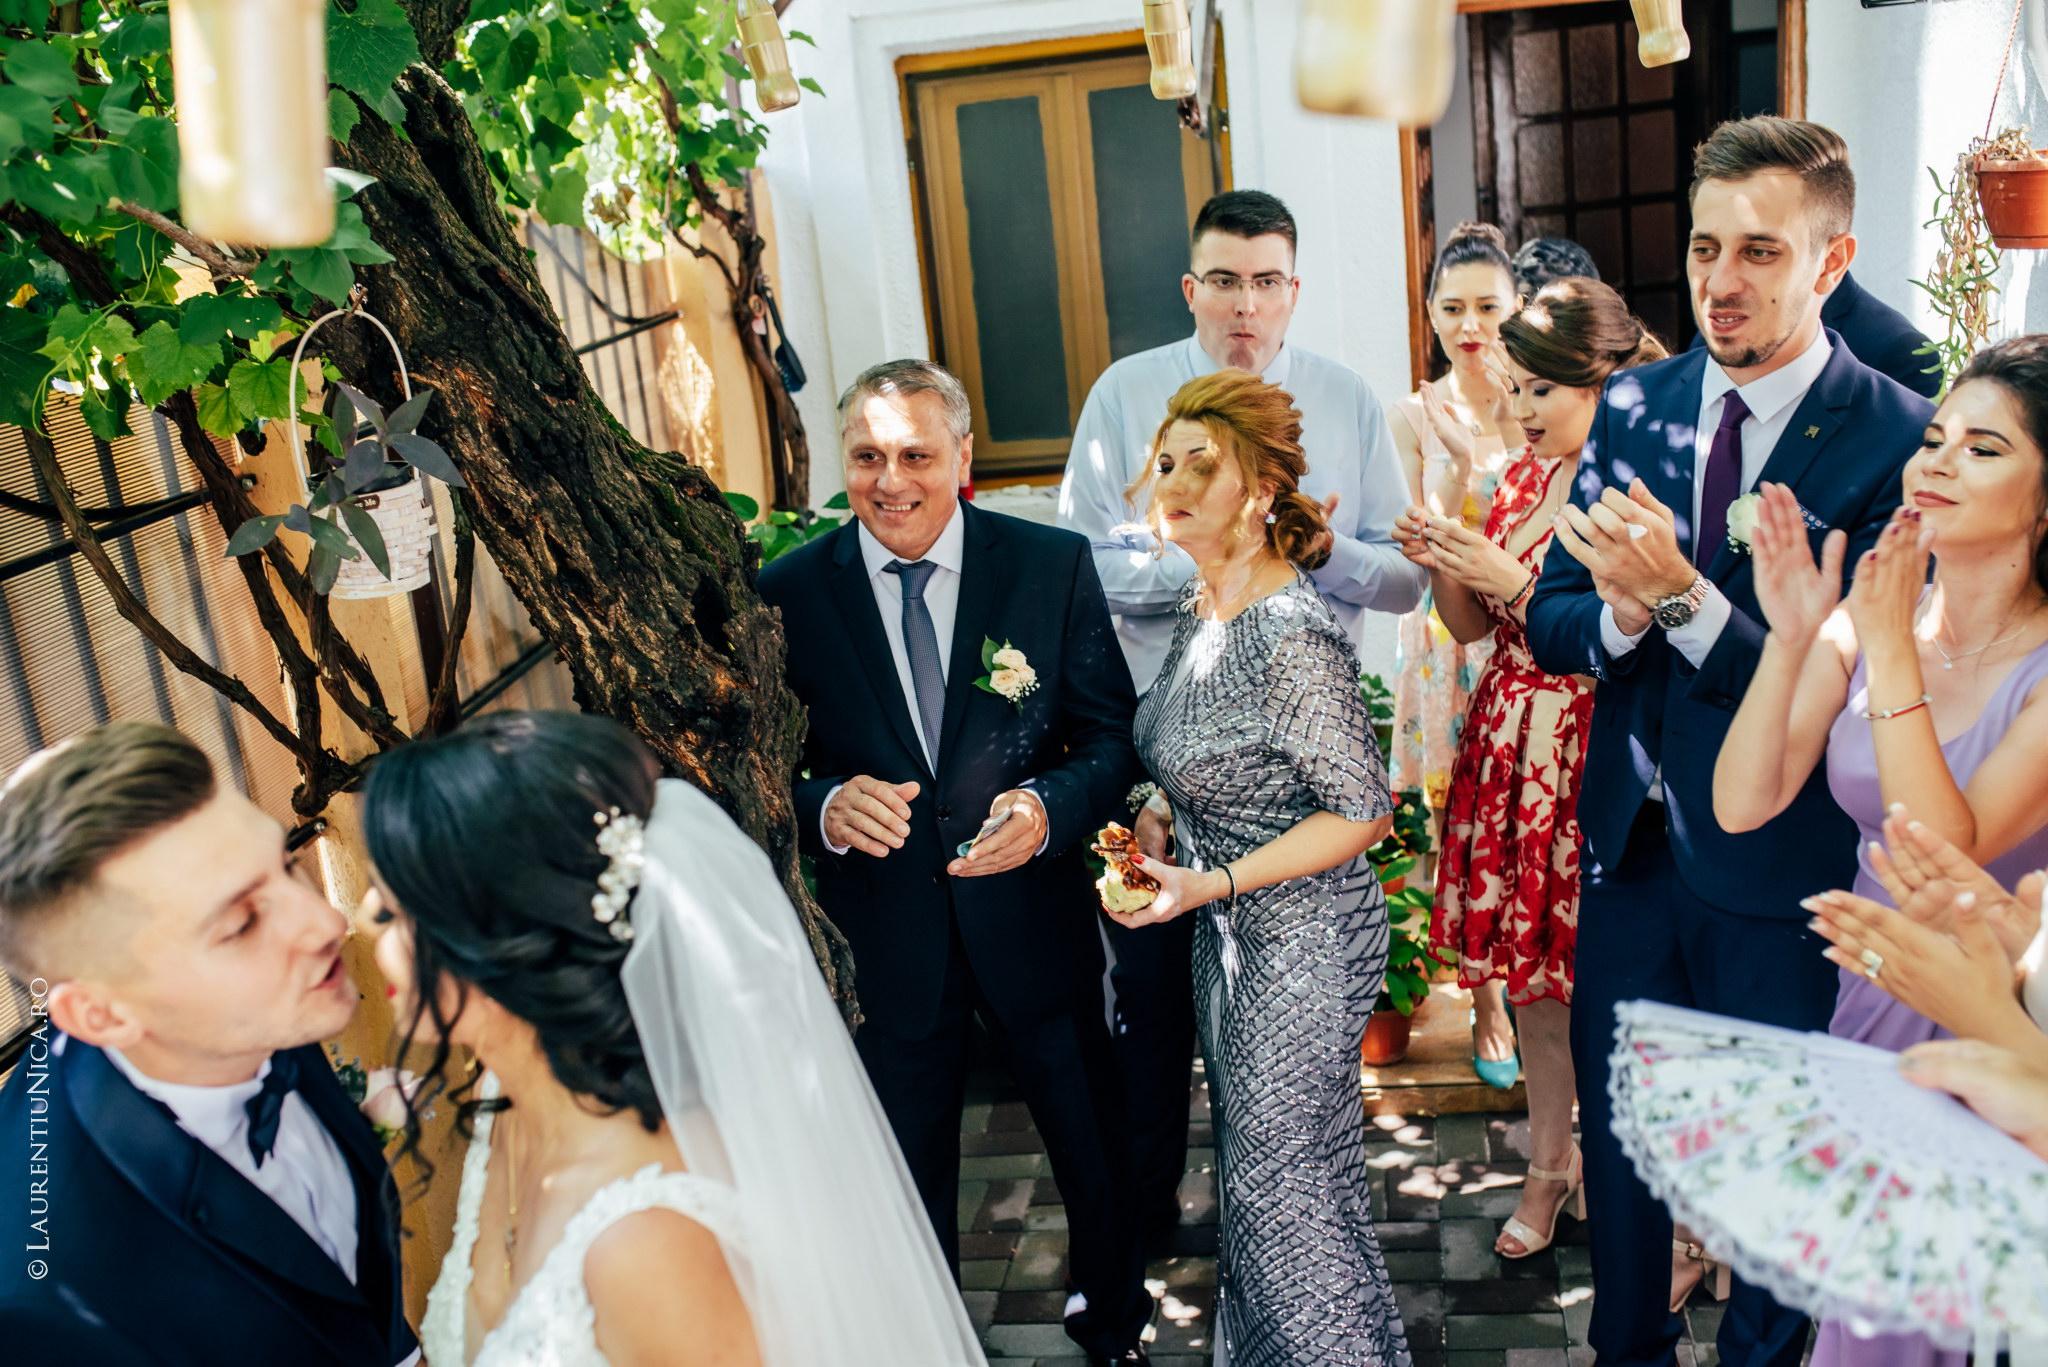 fotografii nunta craiova bia alex fotograf nunta laurentiu nica 24 - Bia & Alex | Fotografii nunta | Craiova